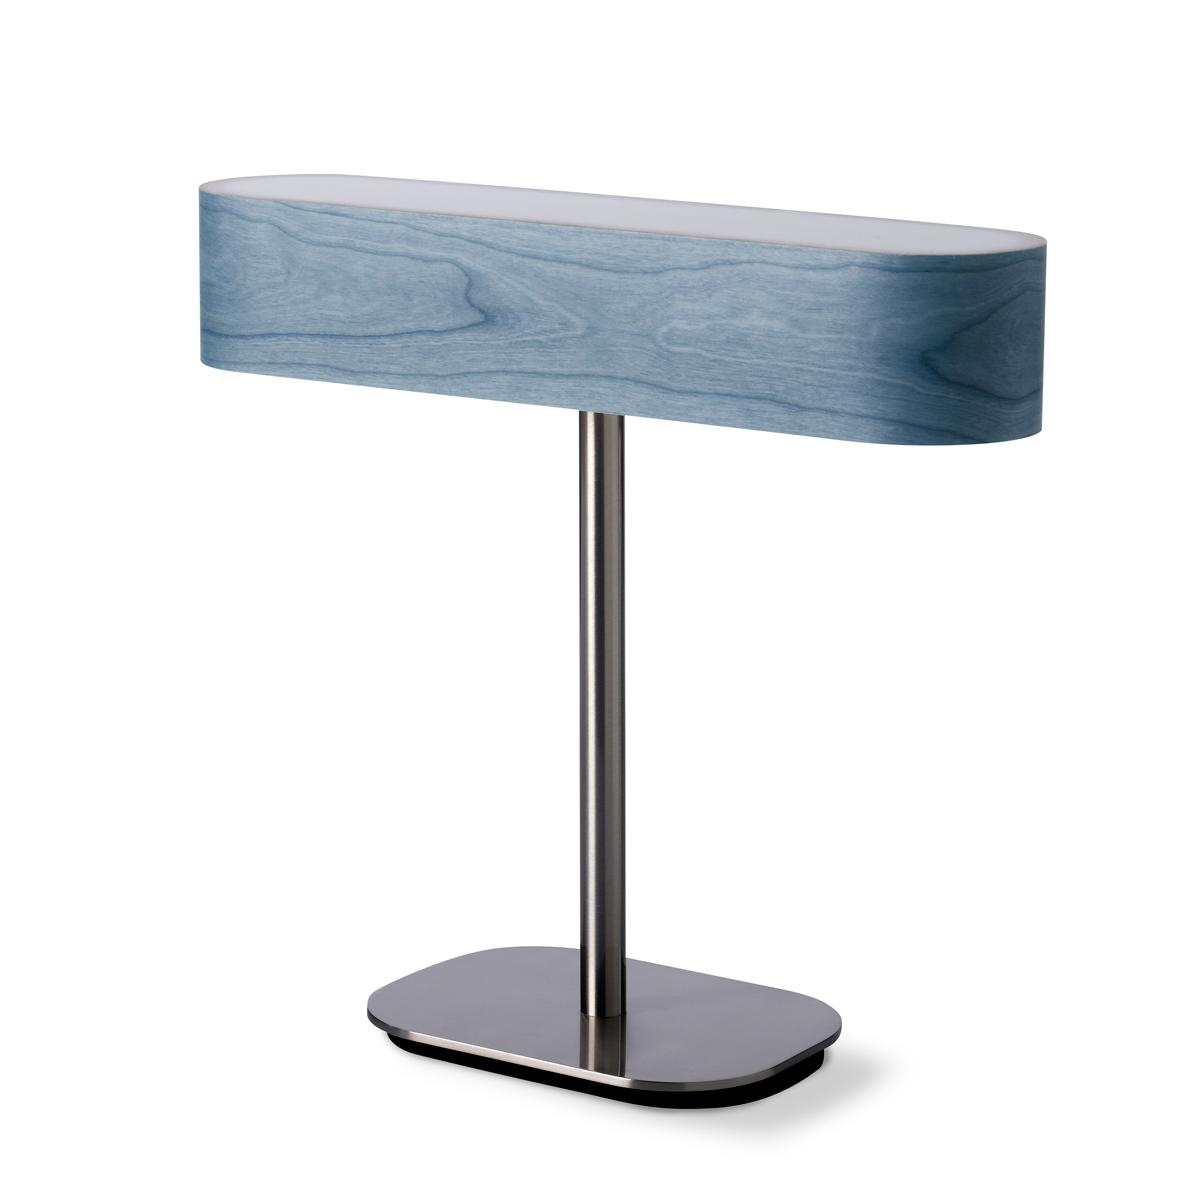 LZF Lamps I-Club LED Tischleuchte I M LED DIM 28